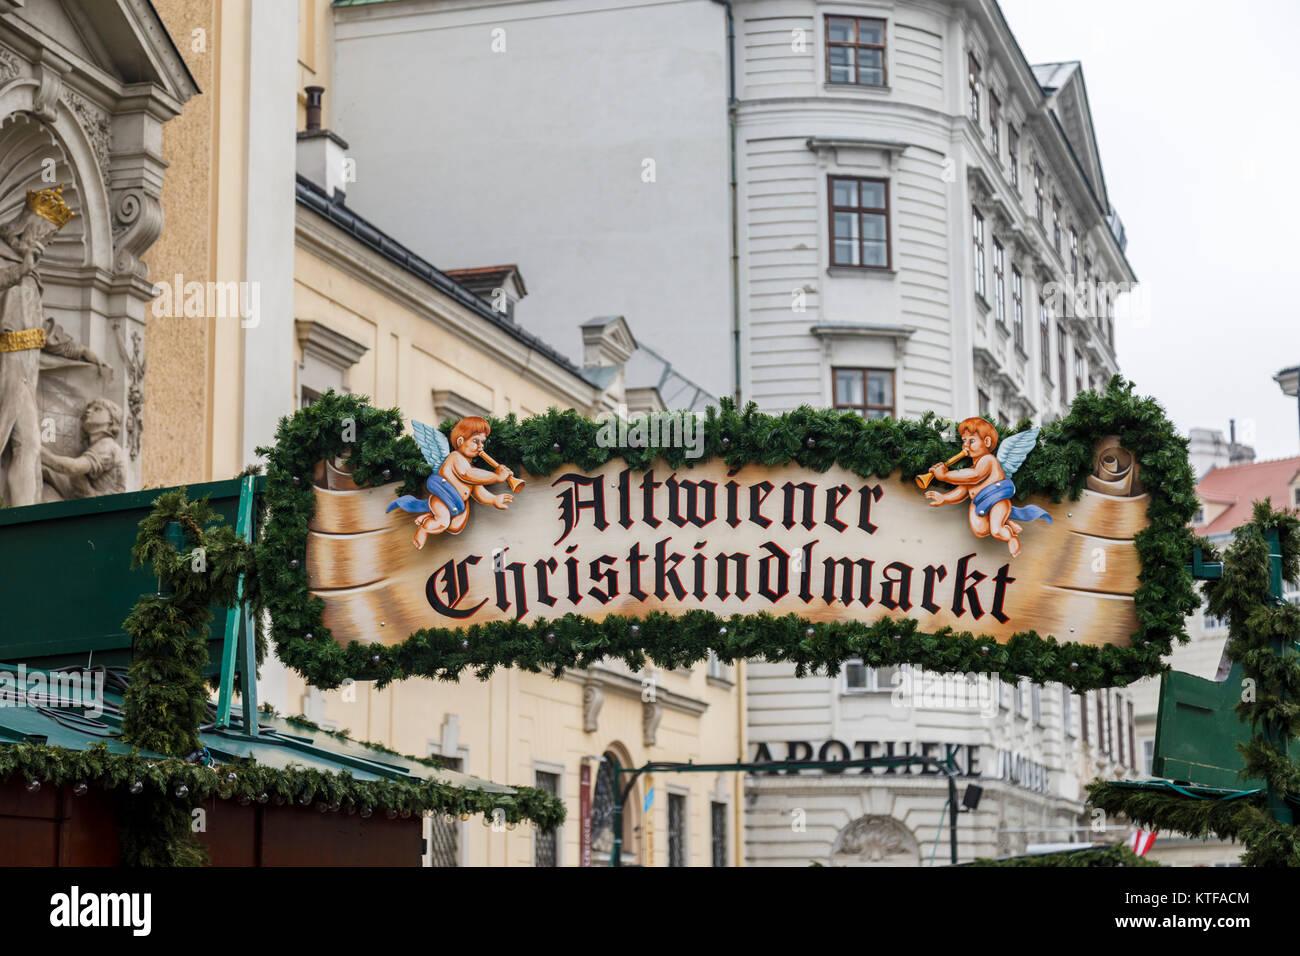 Entrance sign at the traditional festive season Altwiener Christkindlmarkt, an old Vienna Christmas Market, Freyung, - Stock Image